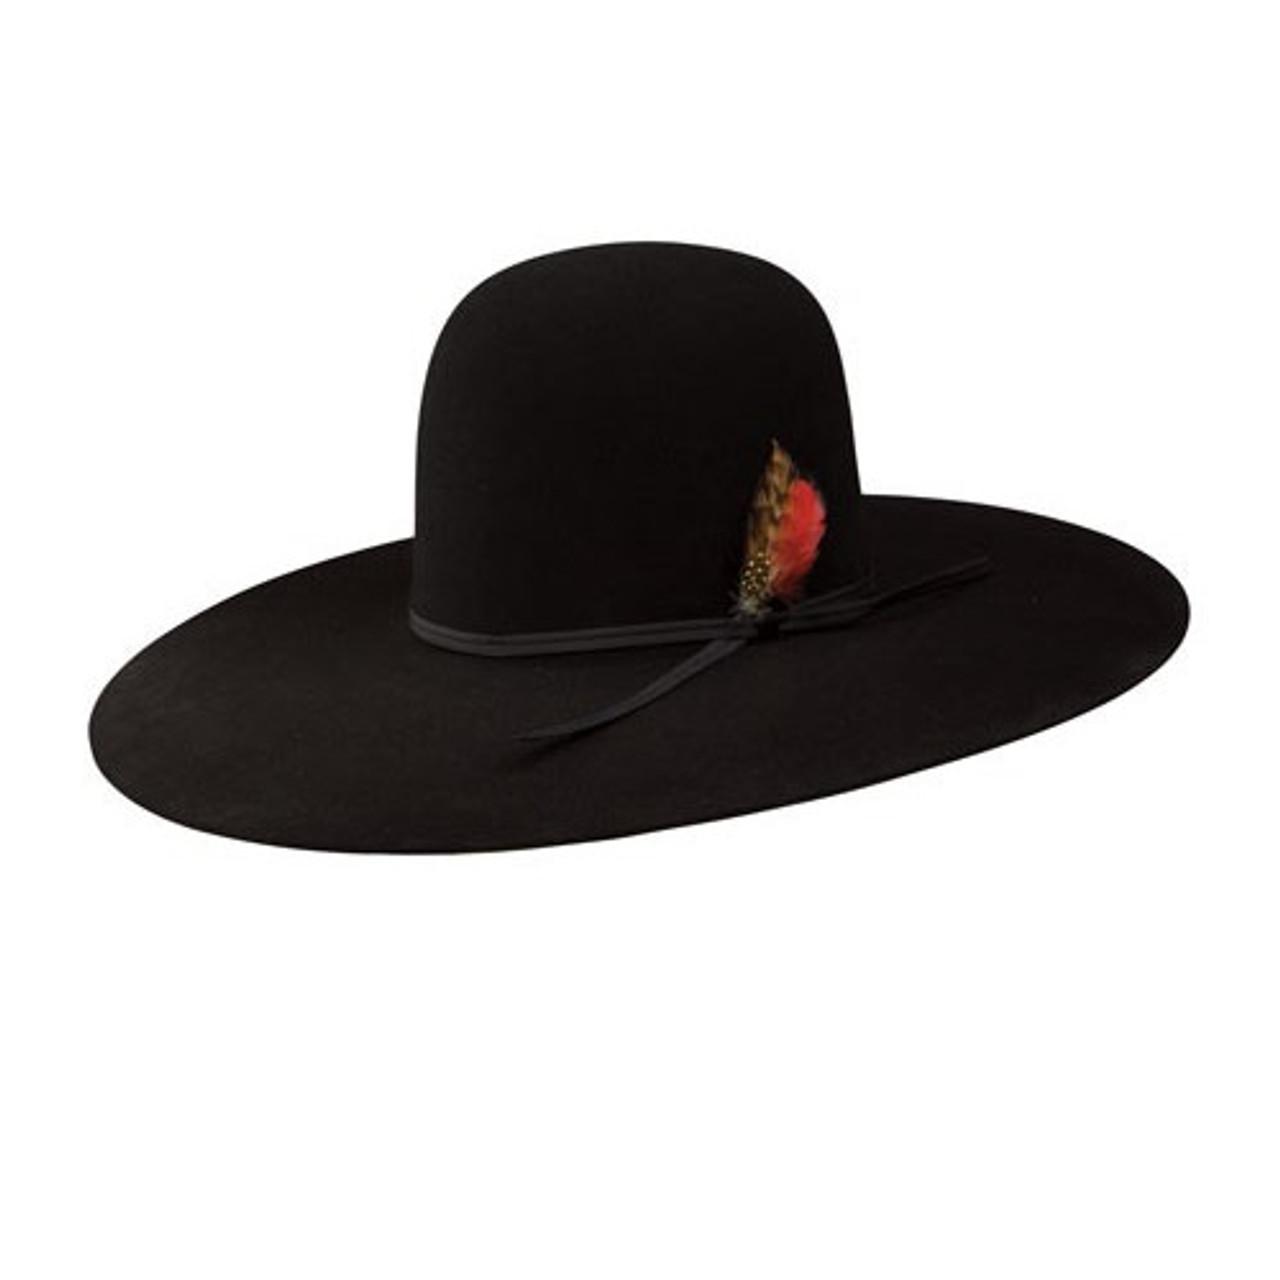 7bd56f3830c Cinch black felt hats